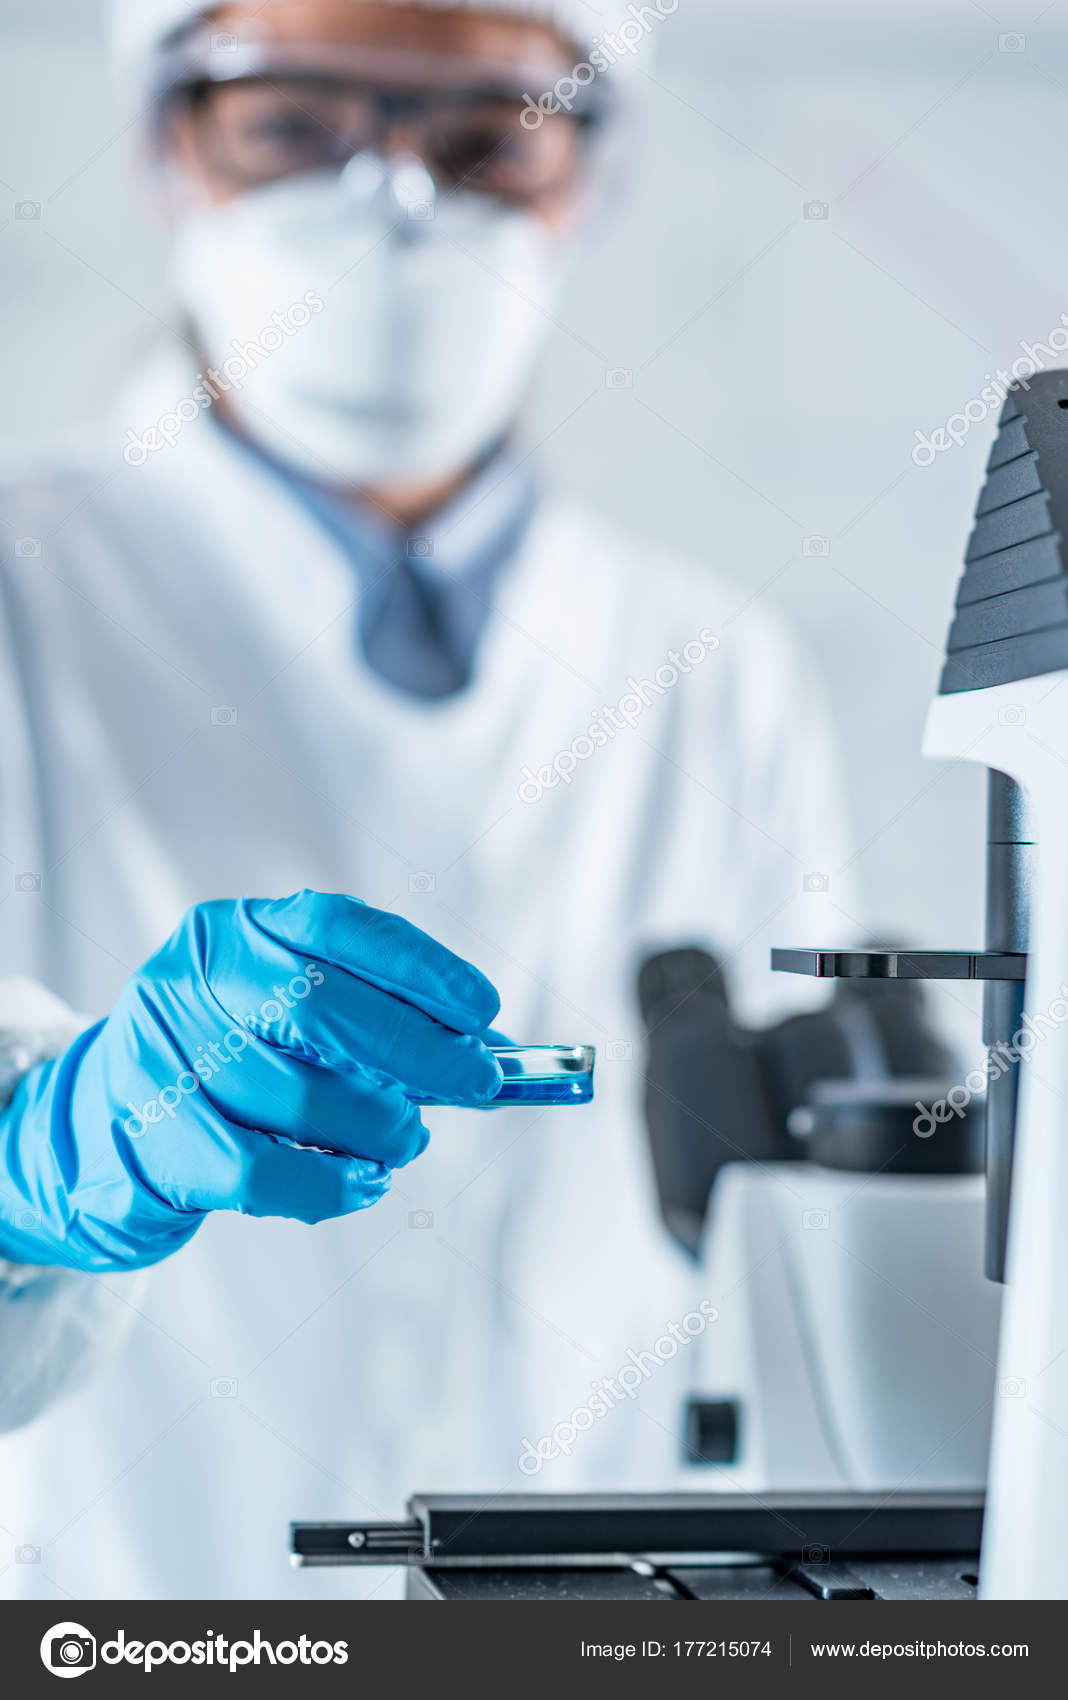 Biotech Lab Research Technician Placing Petri Dish Cell Culture